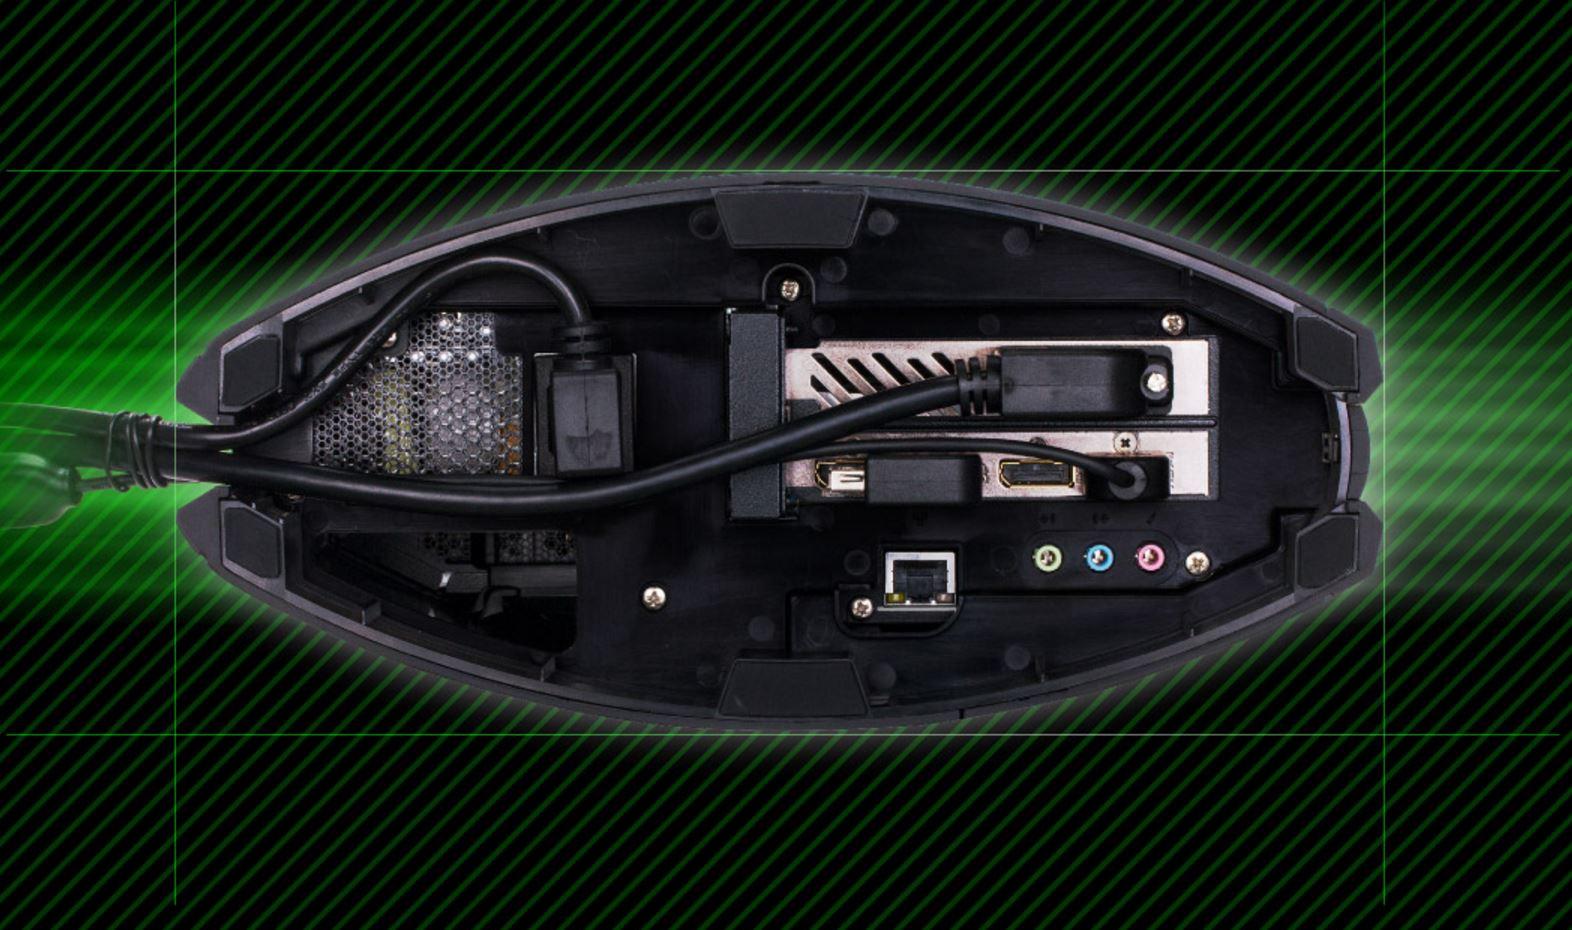 gigabyte-brix-gaming-gt-desktop-600-01